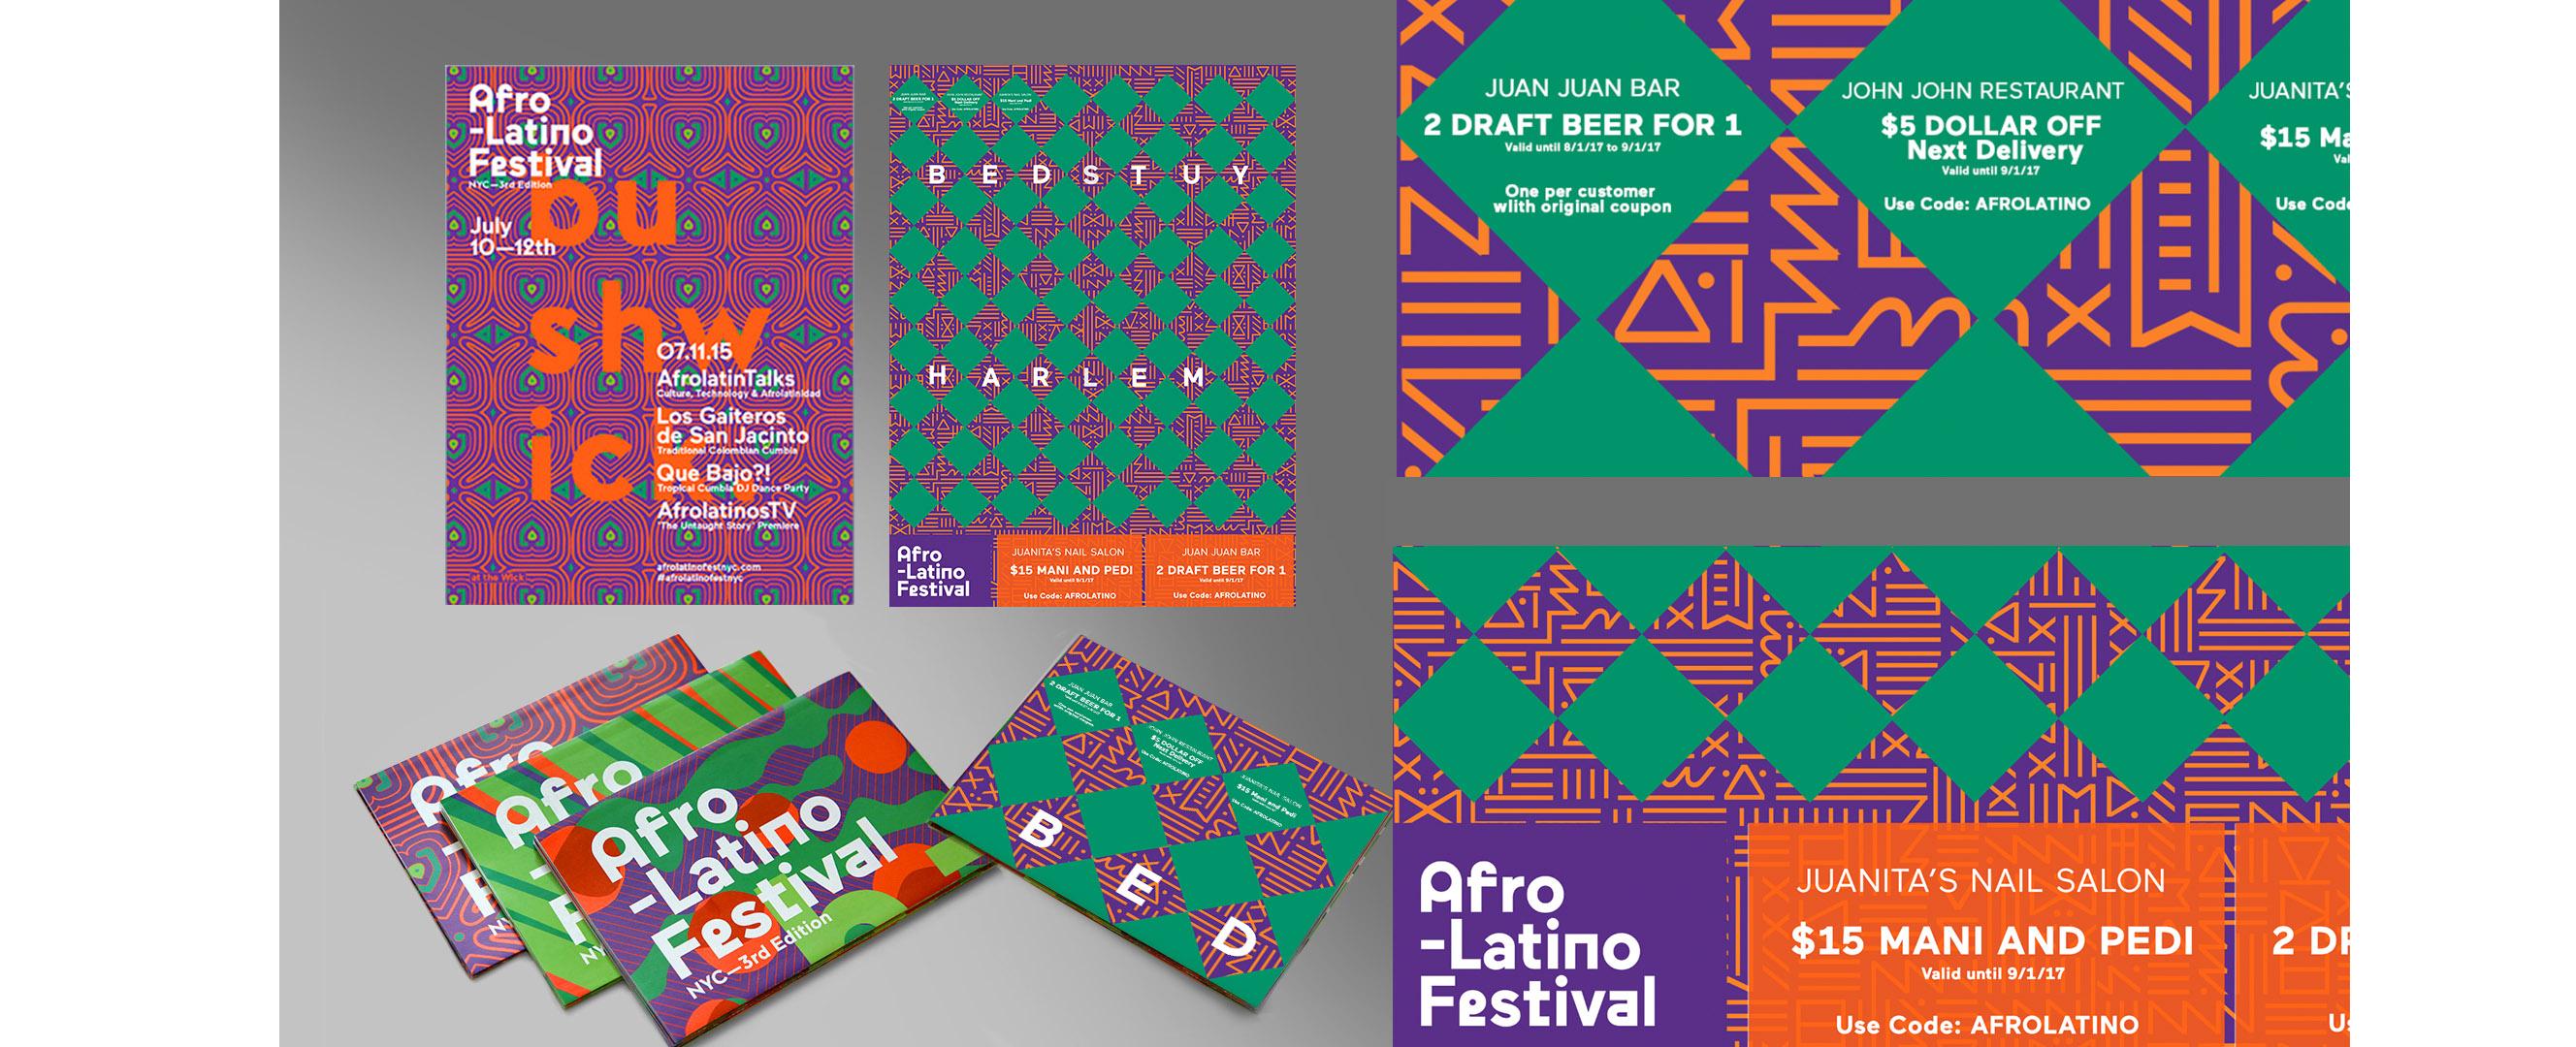 Sample Ad Afro-Latino Festival NYC 2017 Poster/Program